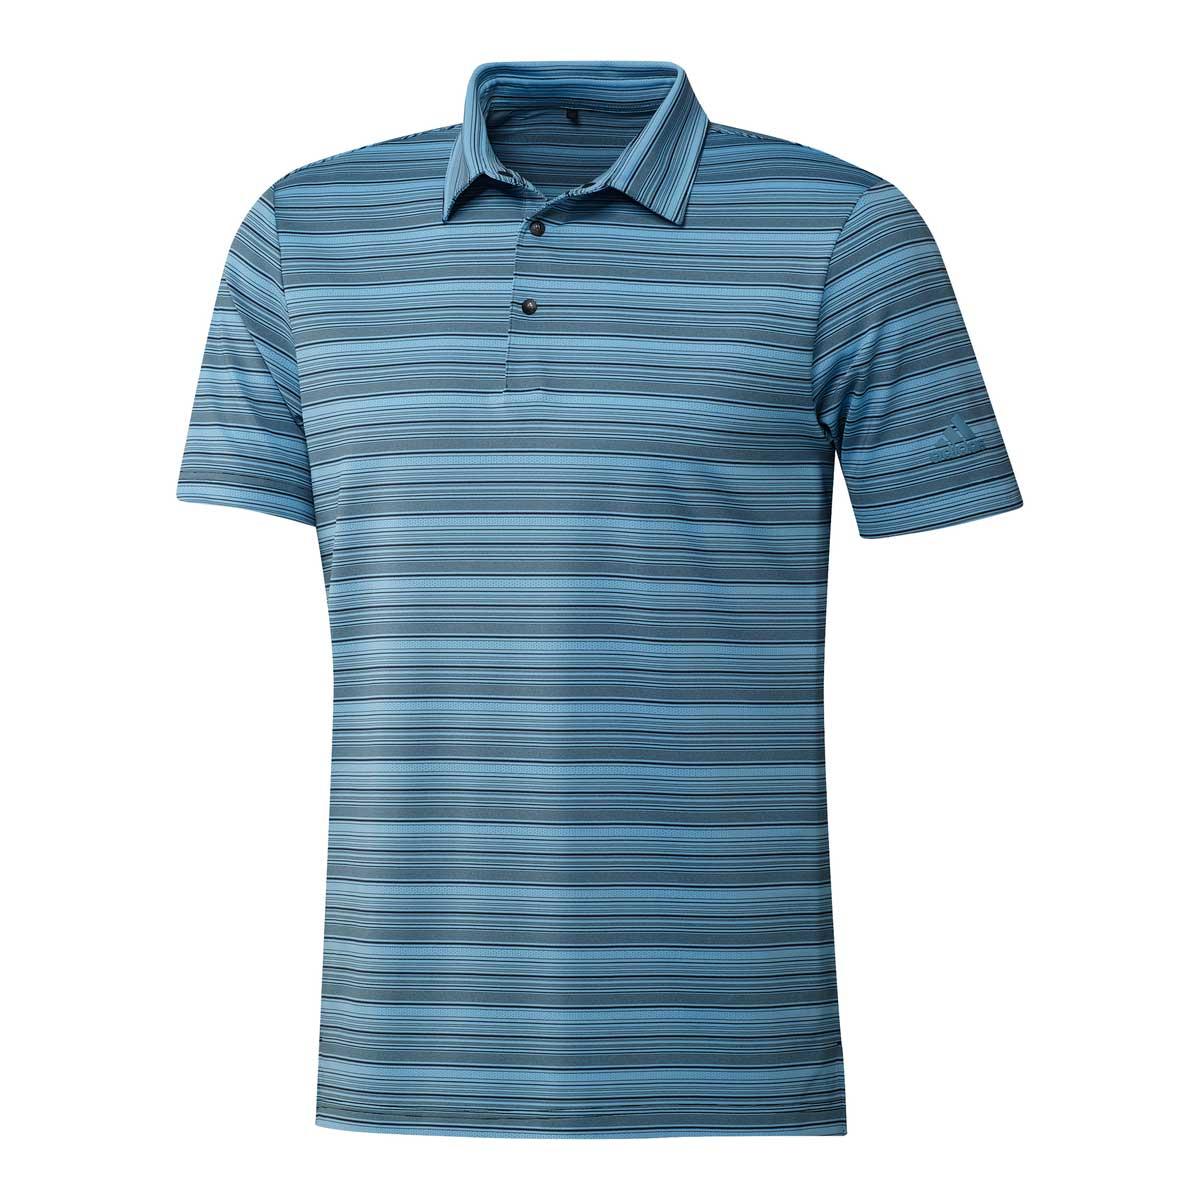 Adidas Men's Heather Snap Black/Hazy Blue Polo